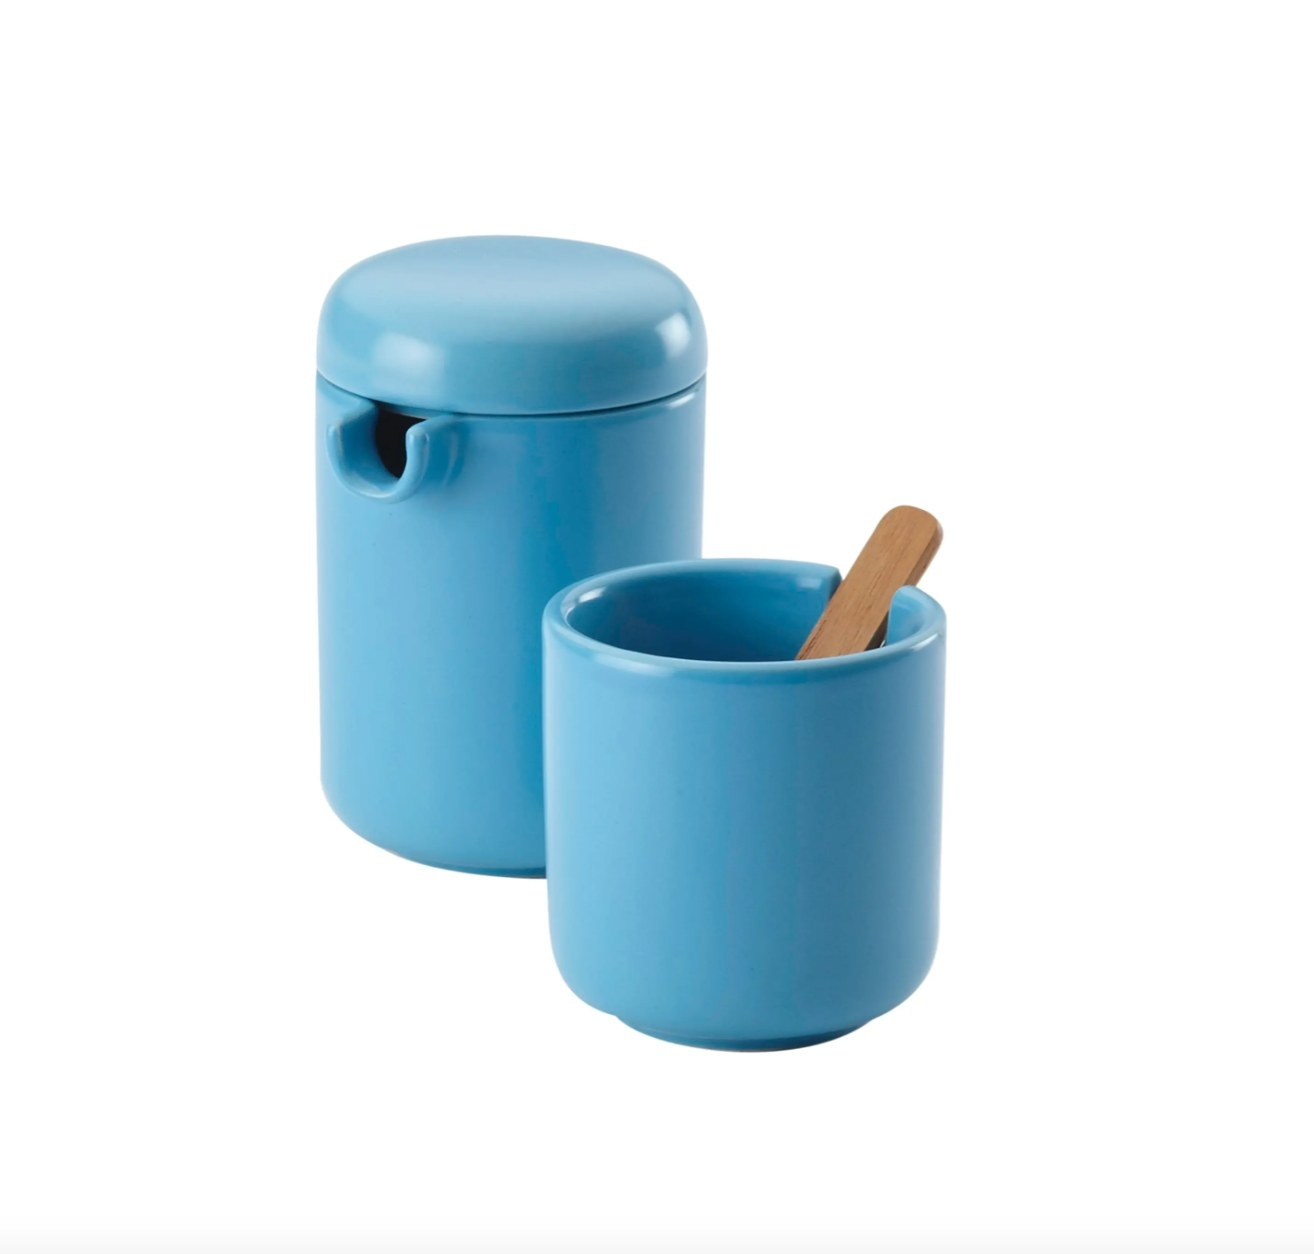 The ceramic coffee and creamer set in aqua